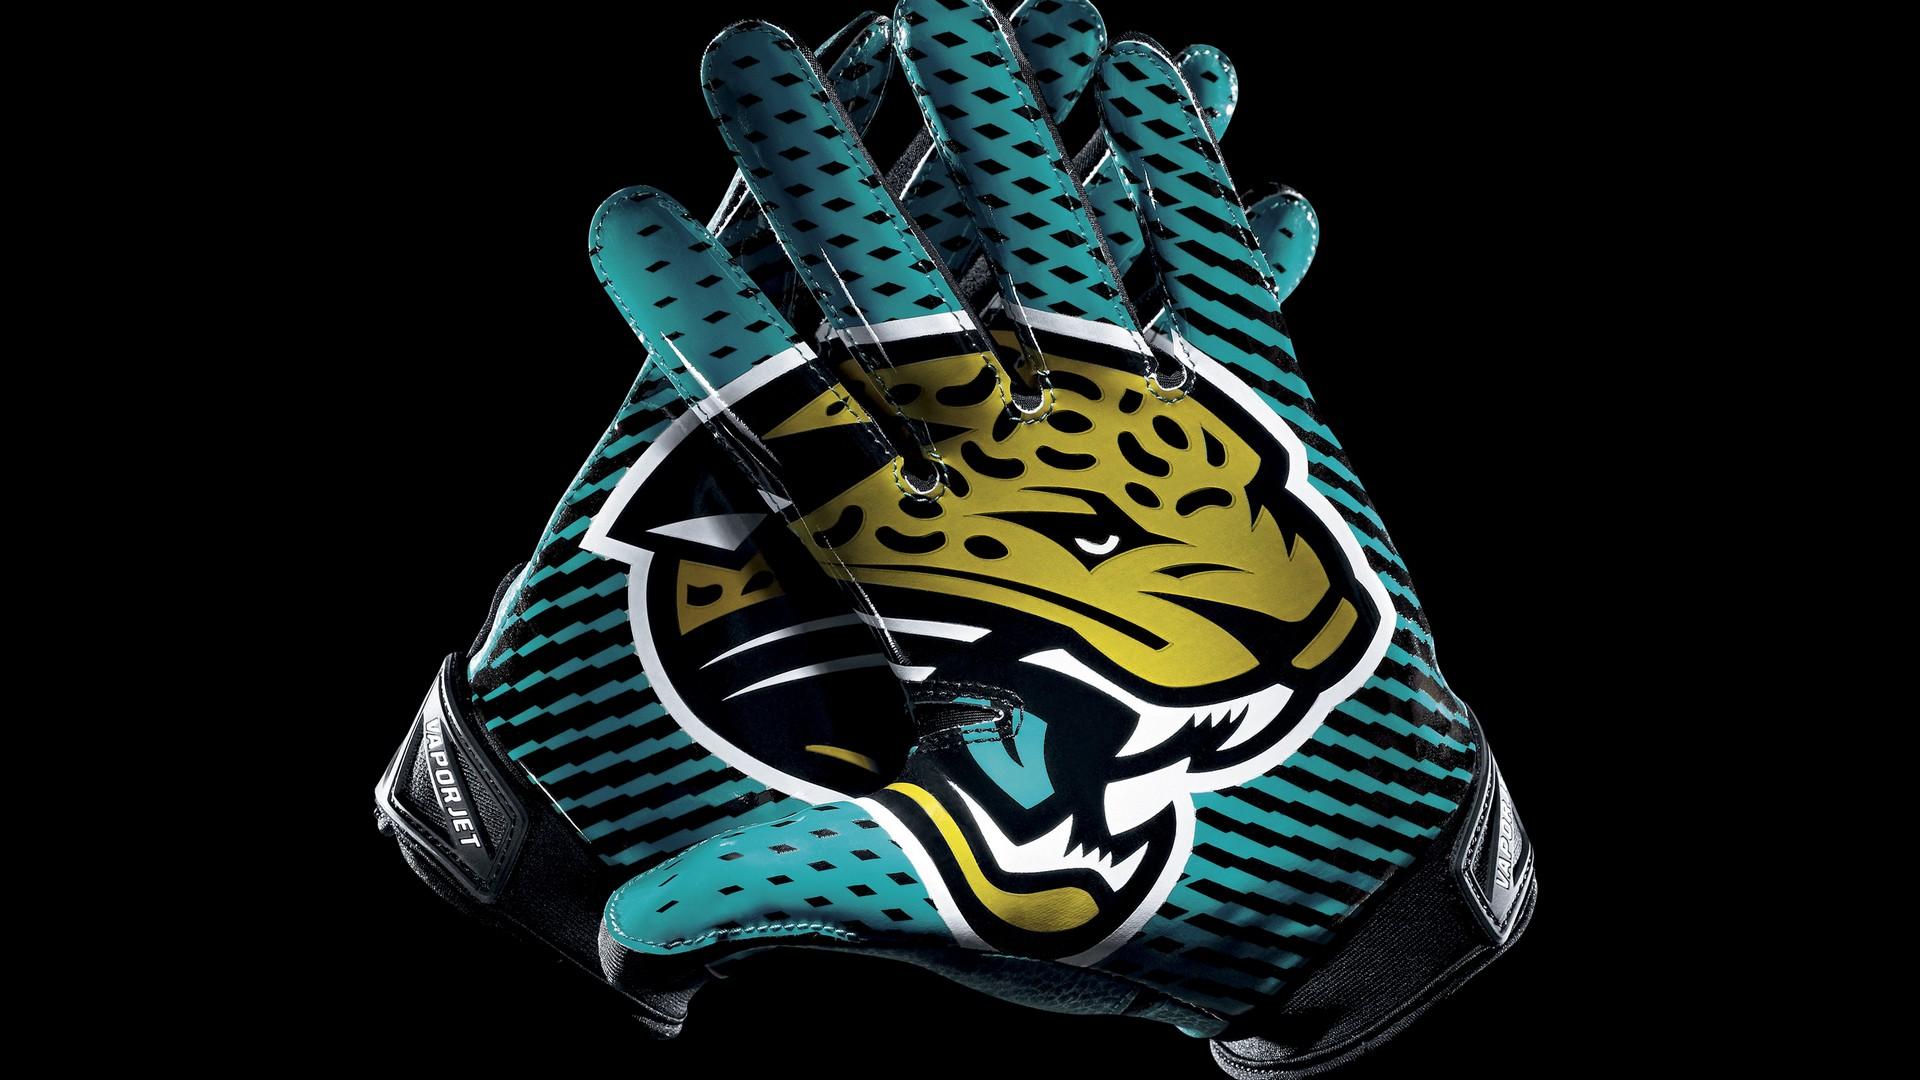 Jacksonville Jaguars Desktop Wallpaper 2019 NFL Football Wallpapers 1920x1080